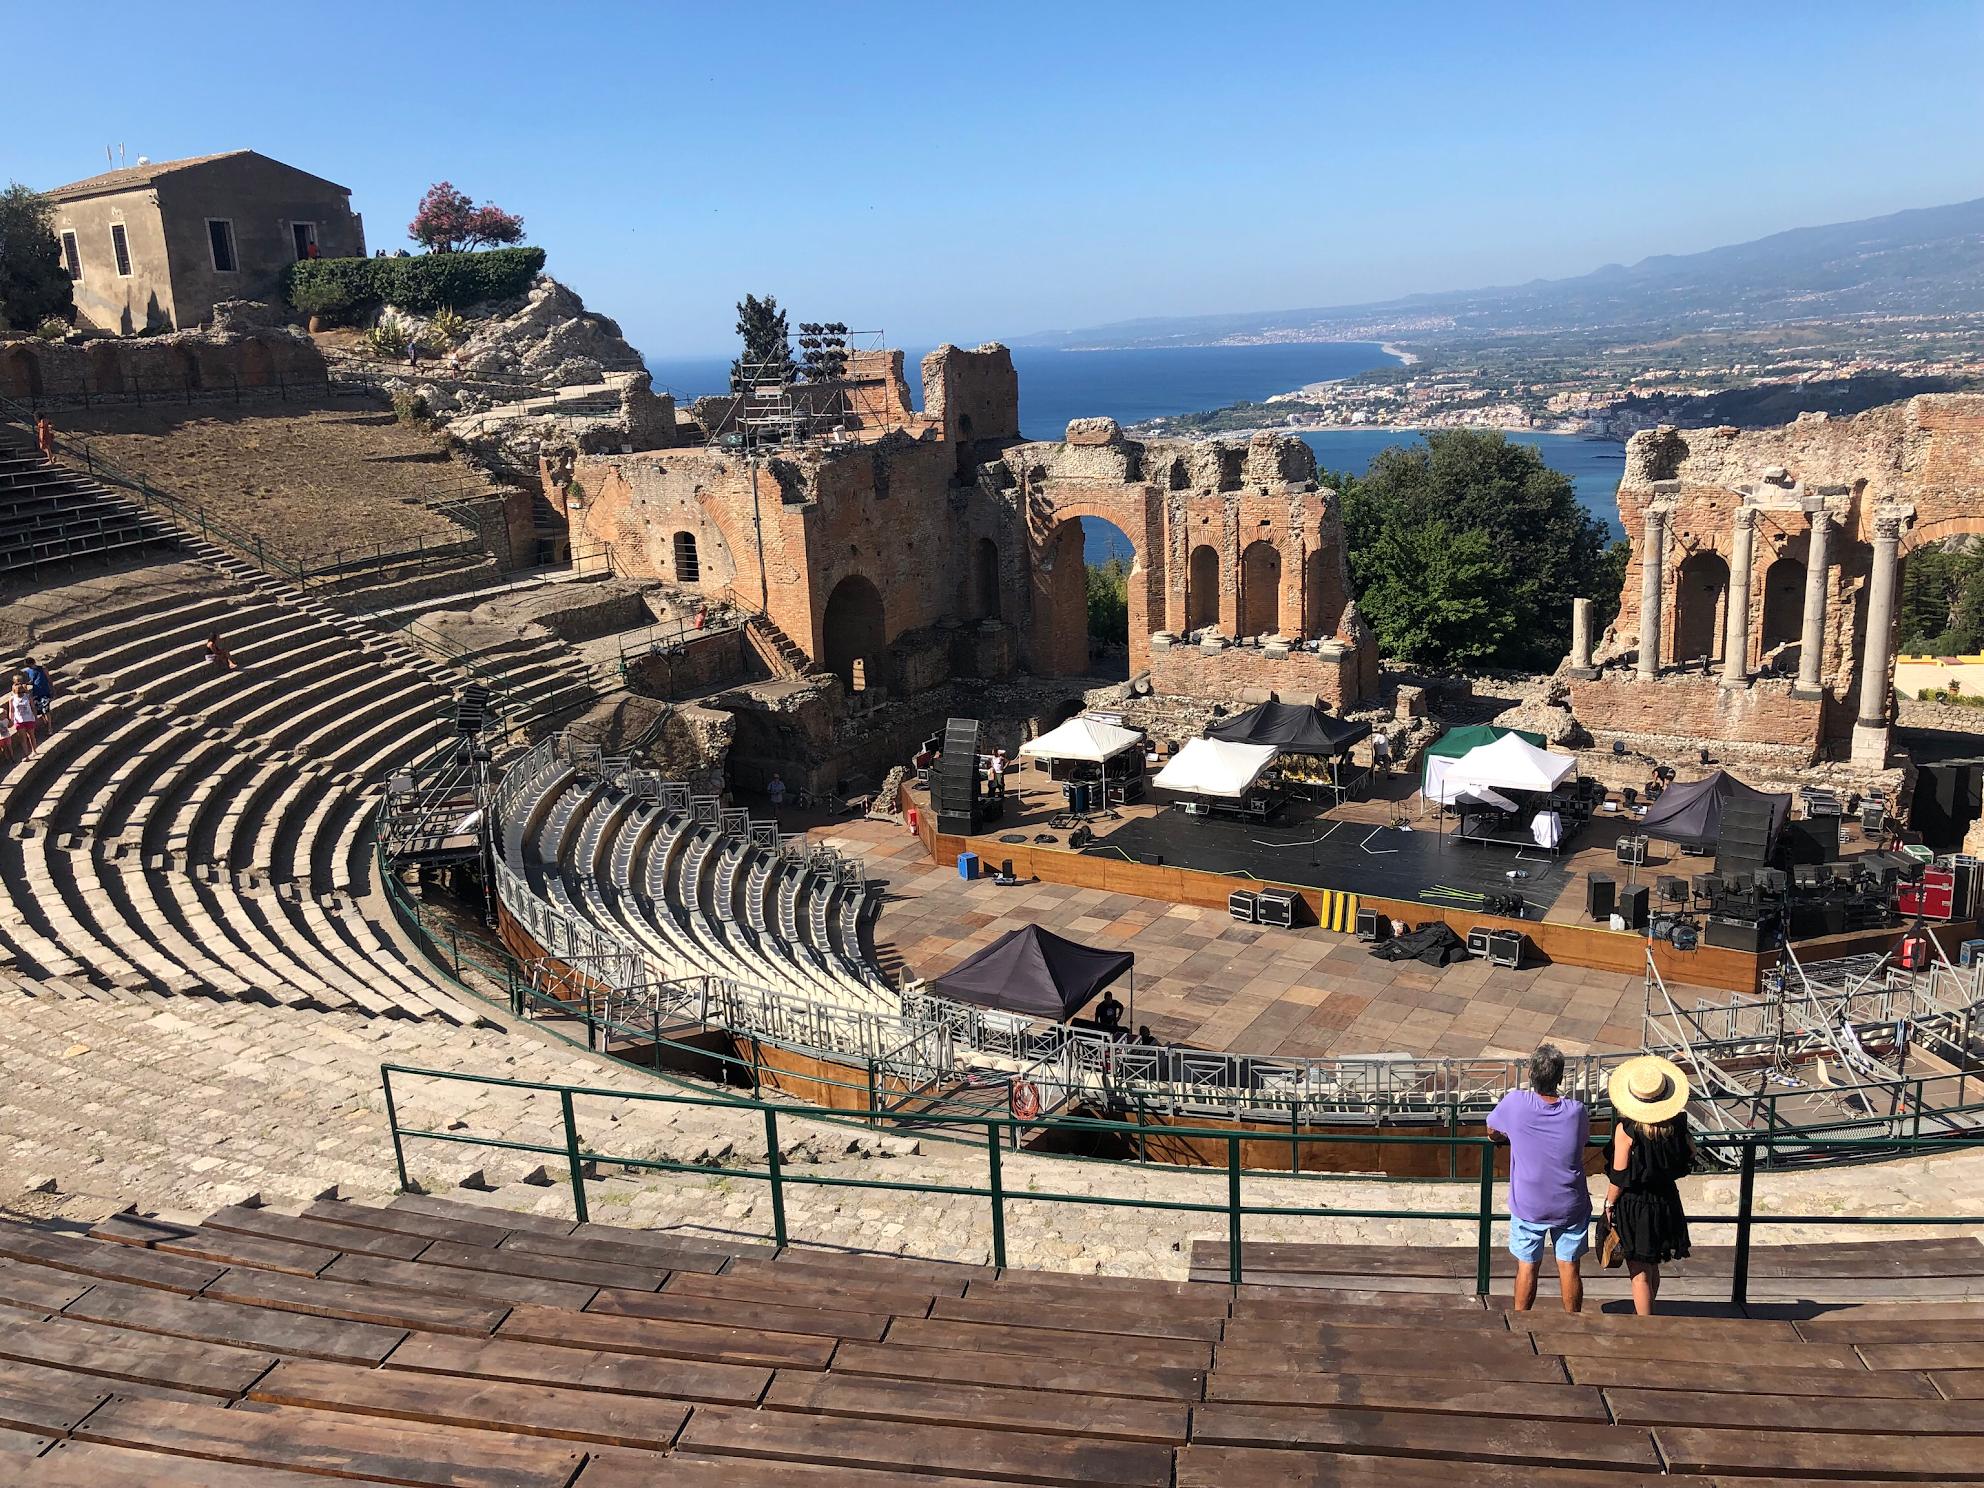 Instagram Spots in Taormina